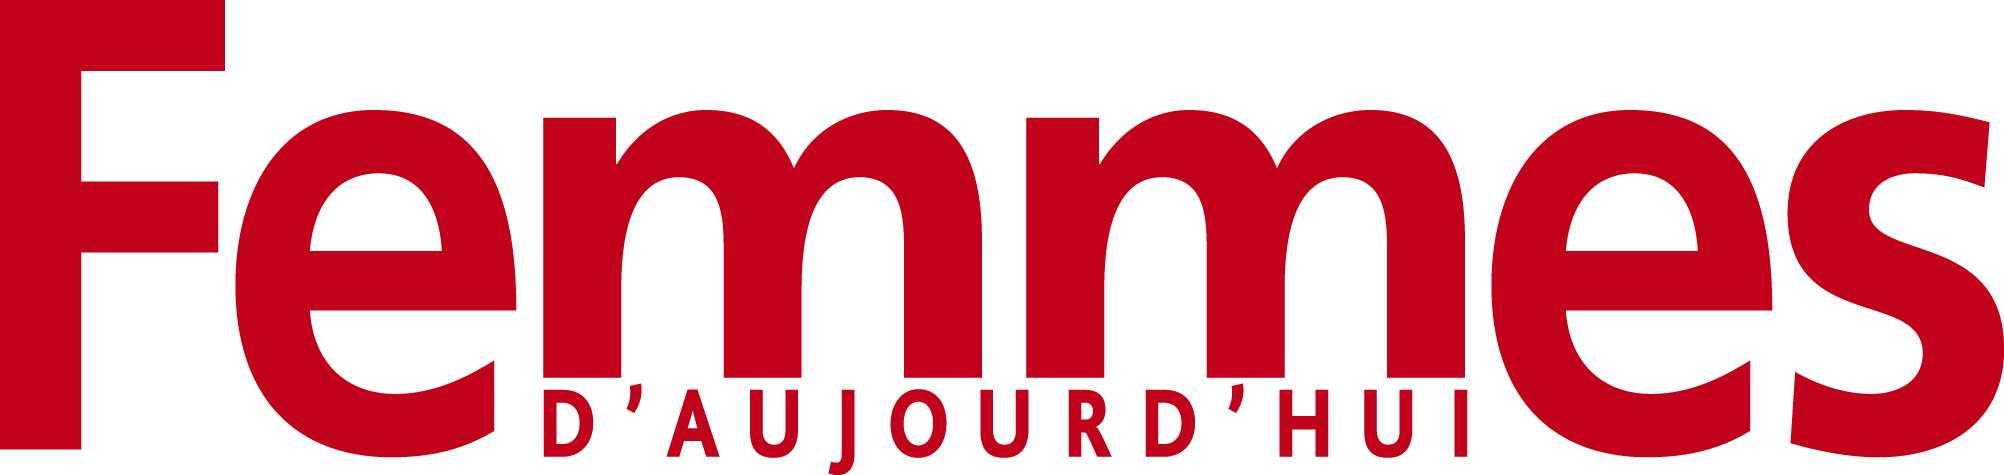 logo-femmes-d-aujourd-hui | Up & Down Hill